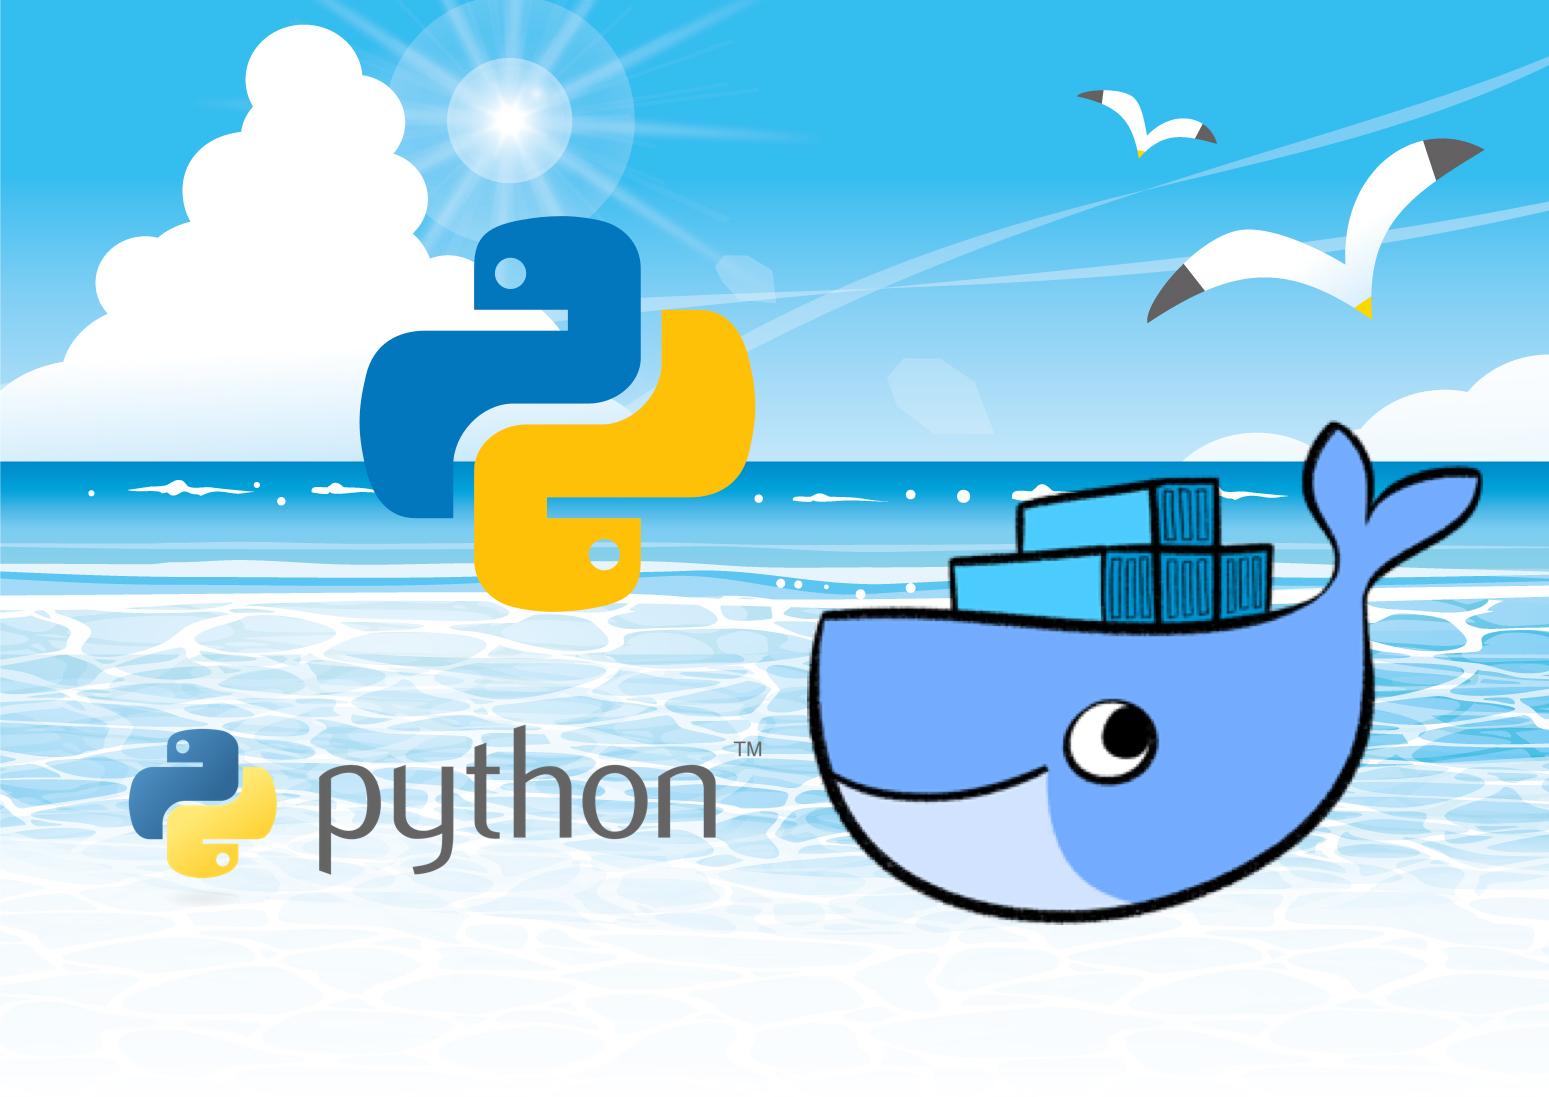 dockerhub_python_centos7